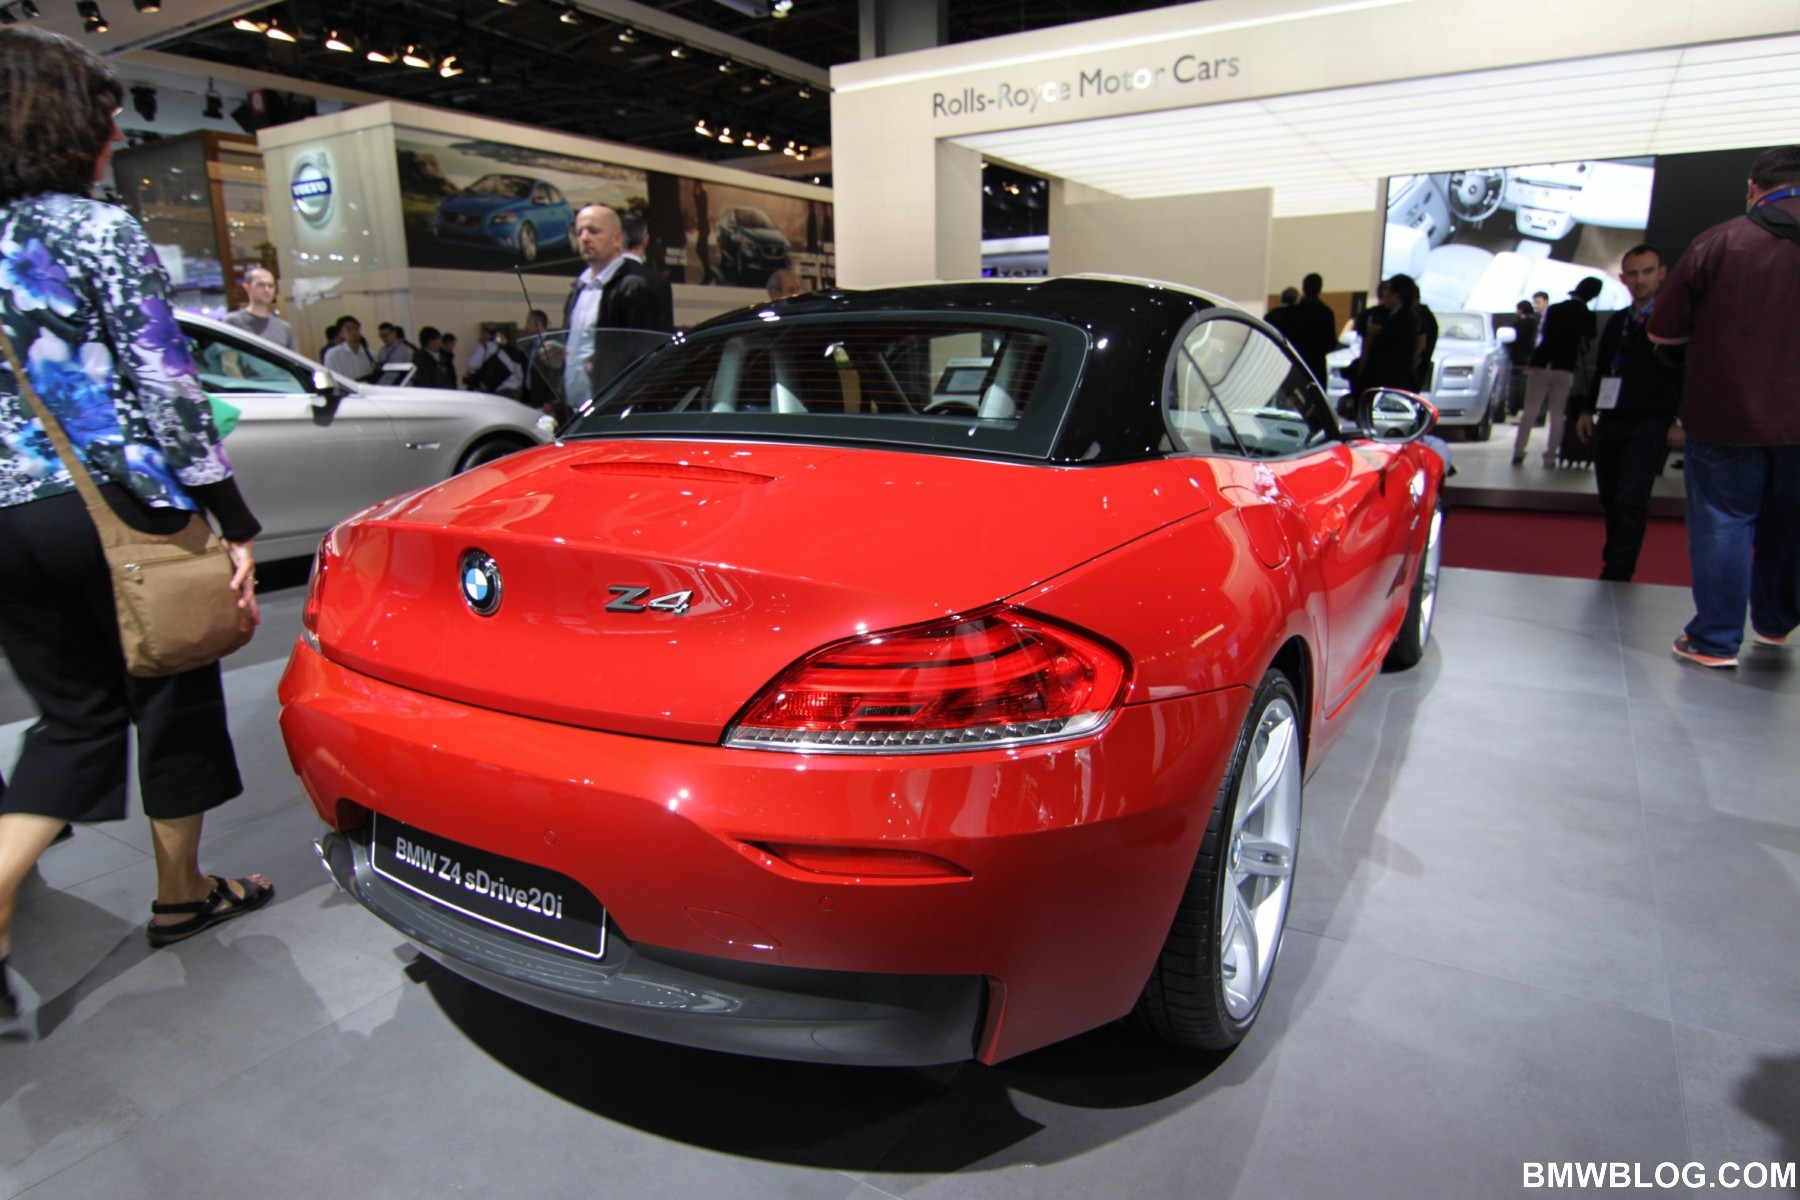 Paris 2012 Bmw Z4 E89 Mit Hardtop In Kontrastfarbe Und M Sportpaket